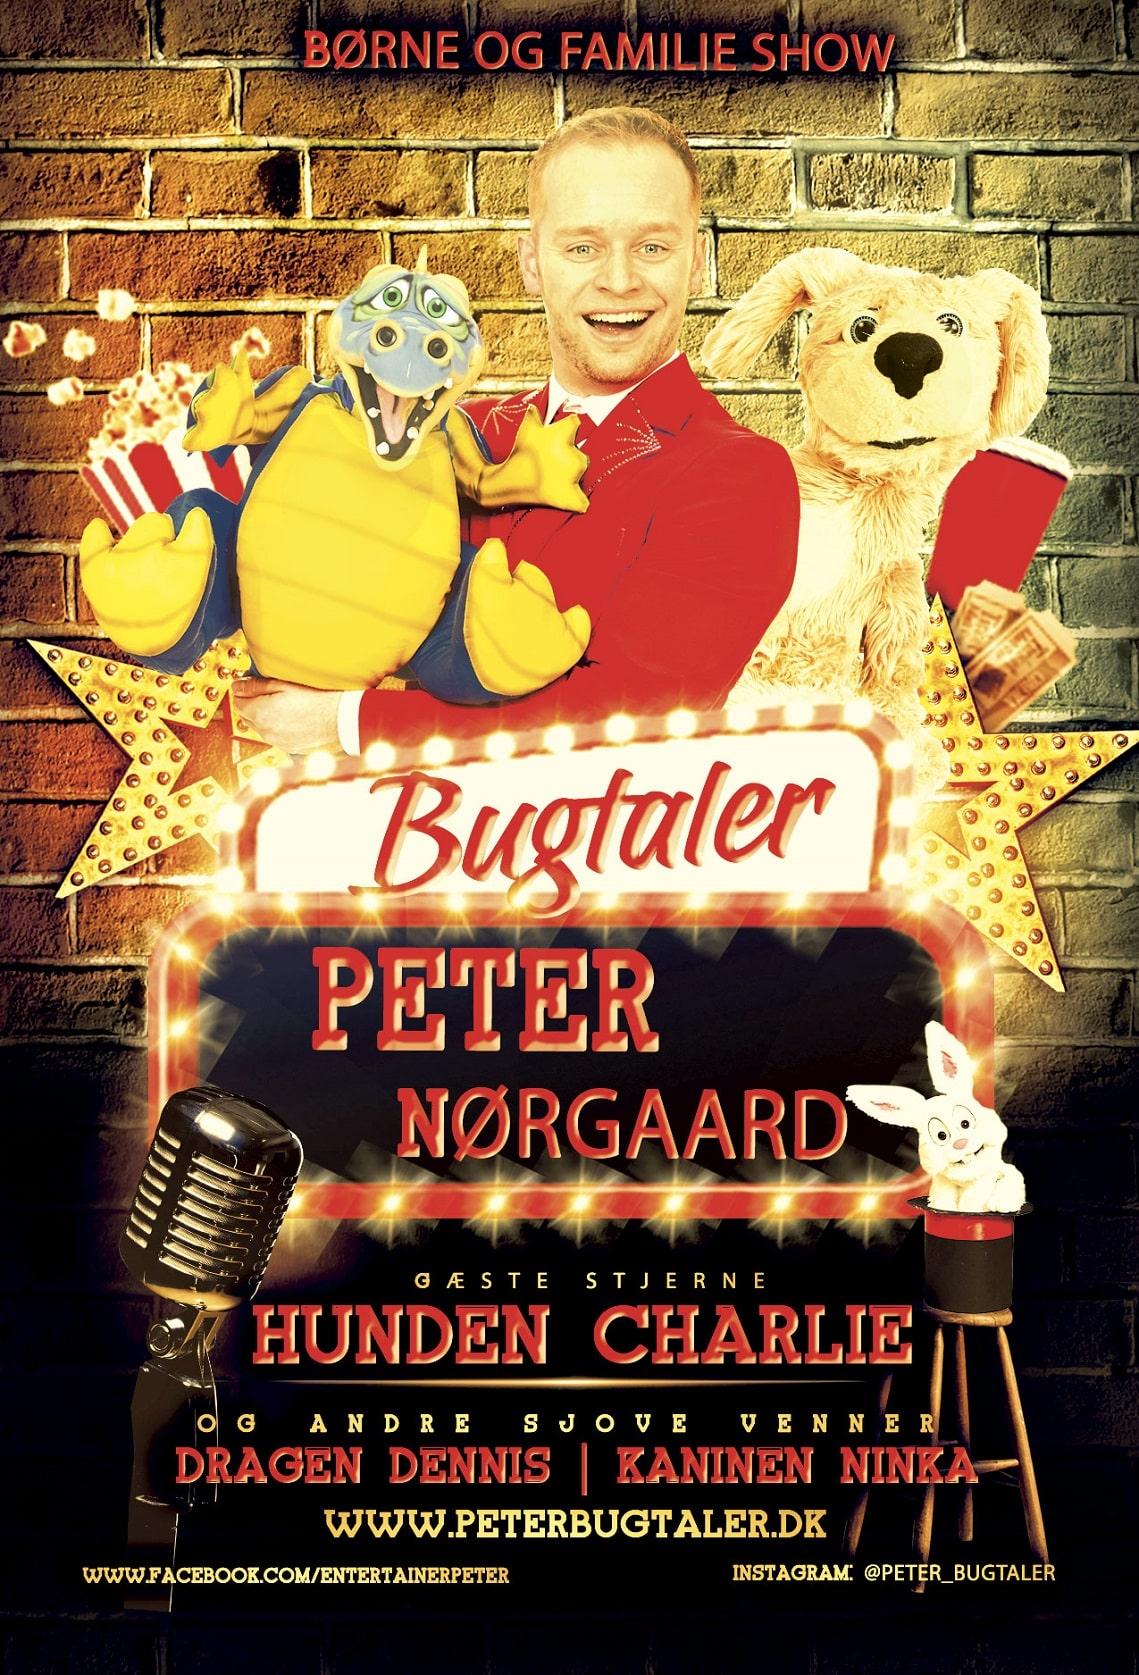 Peter bugtaler